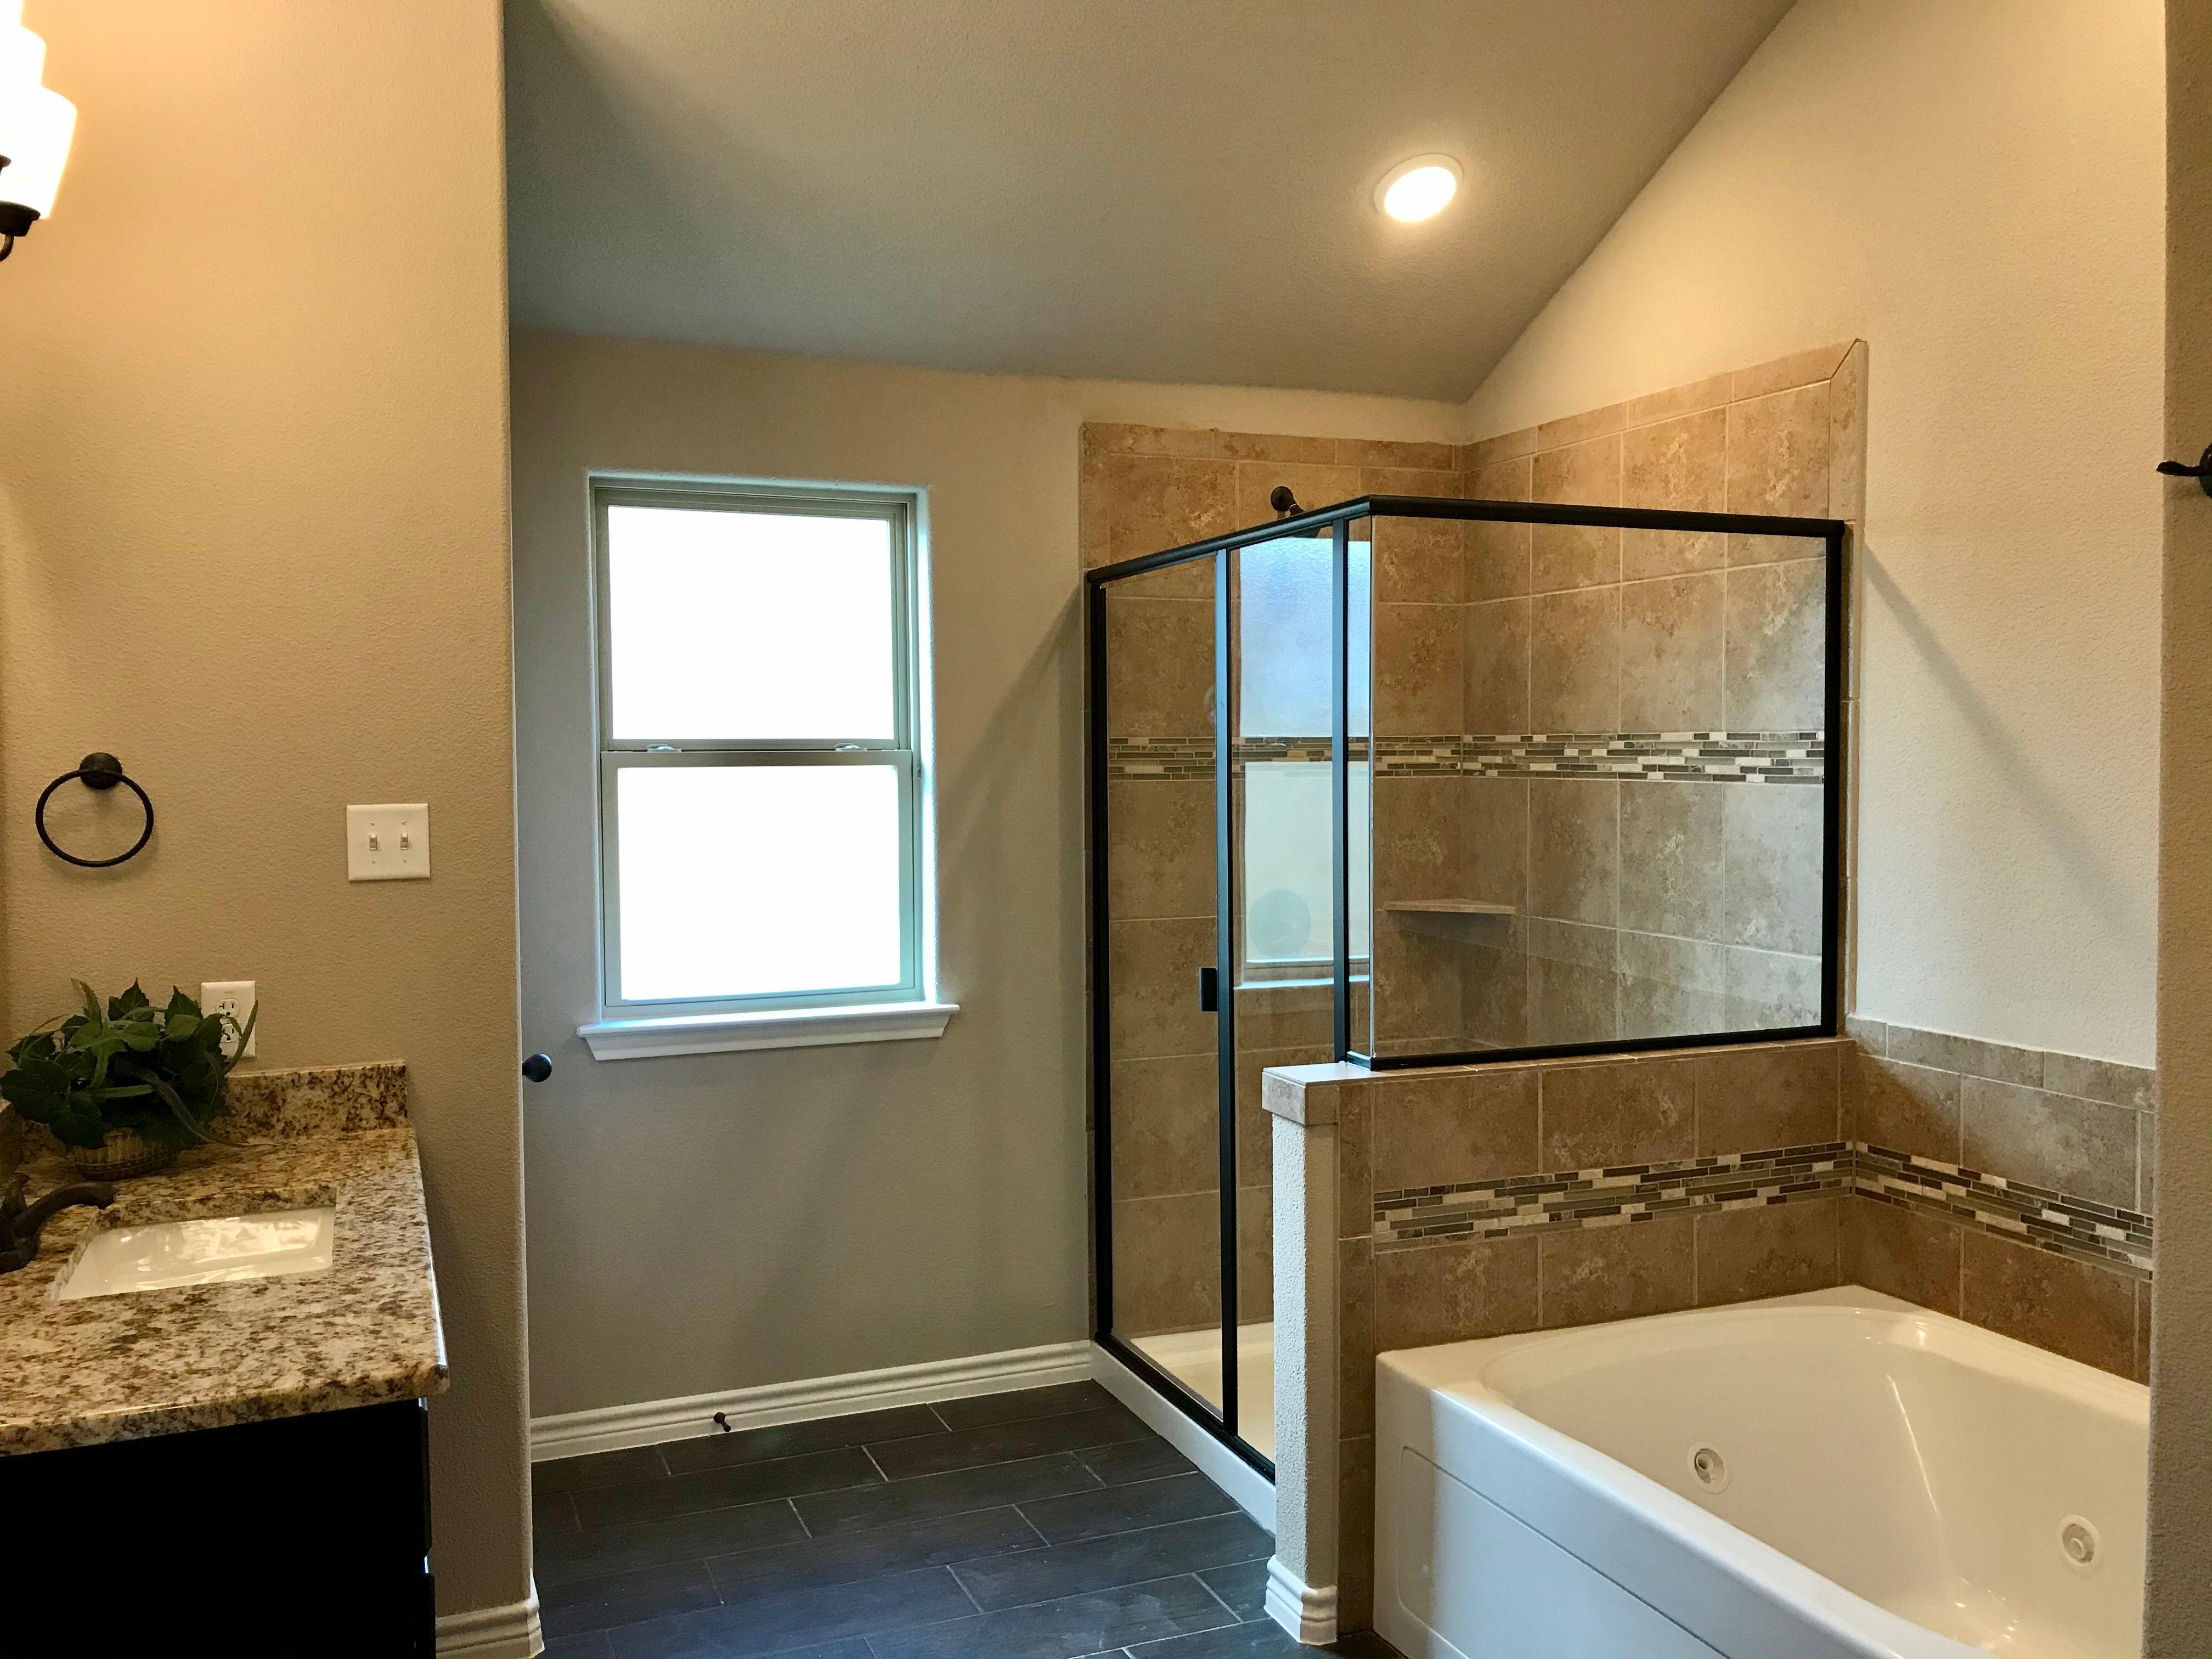 Bathroom featured in the Verde Creek By Ashford Homes in Killeen, TX